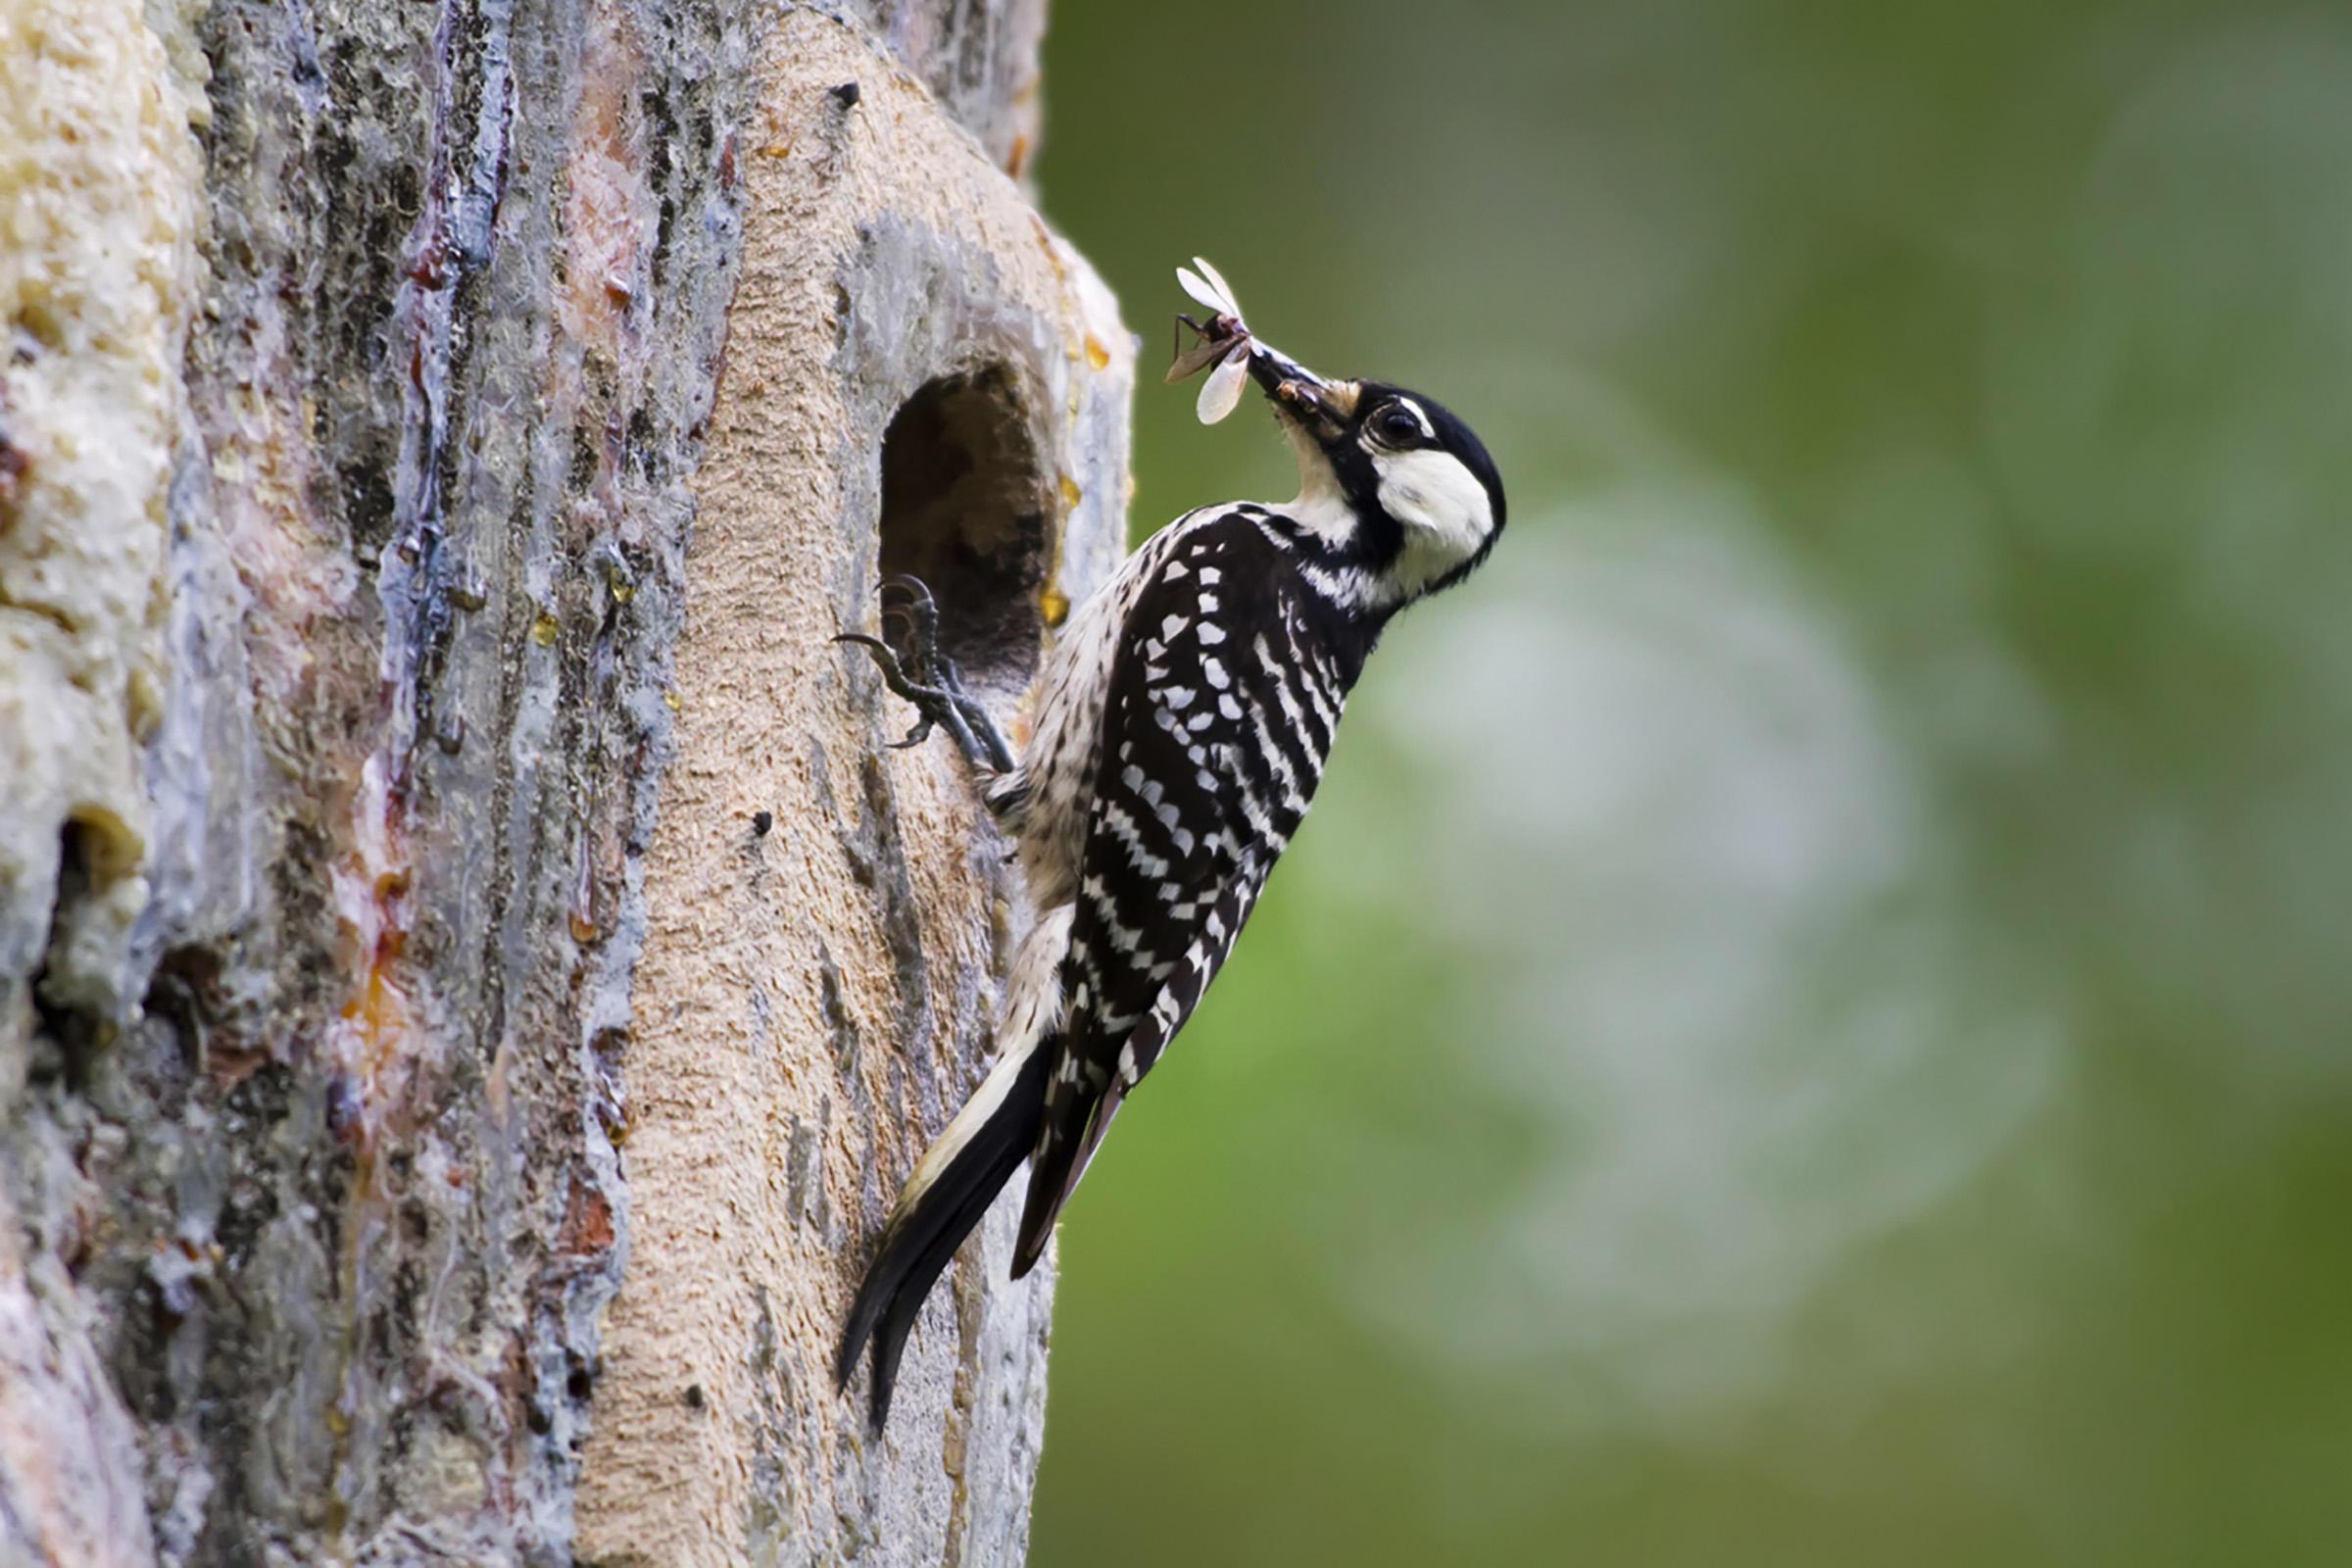 Red-cockaded Woodpecker. Photo by U.S. Fish & Wildlife Service